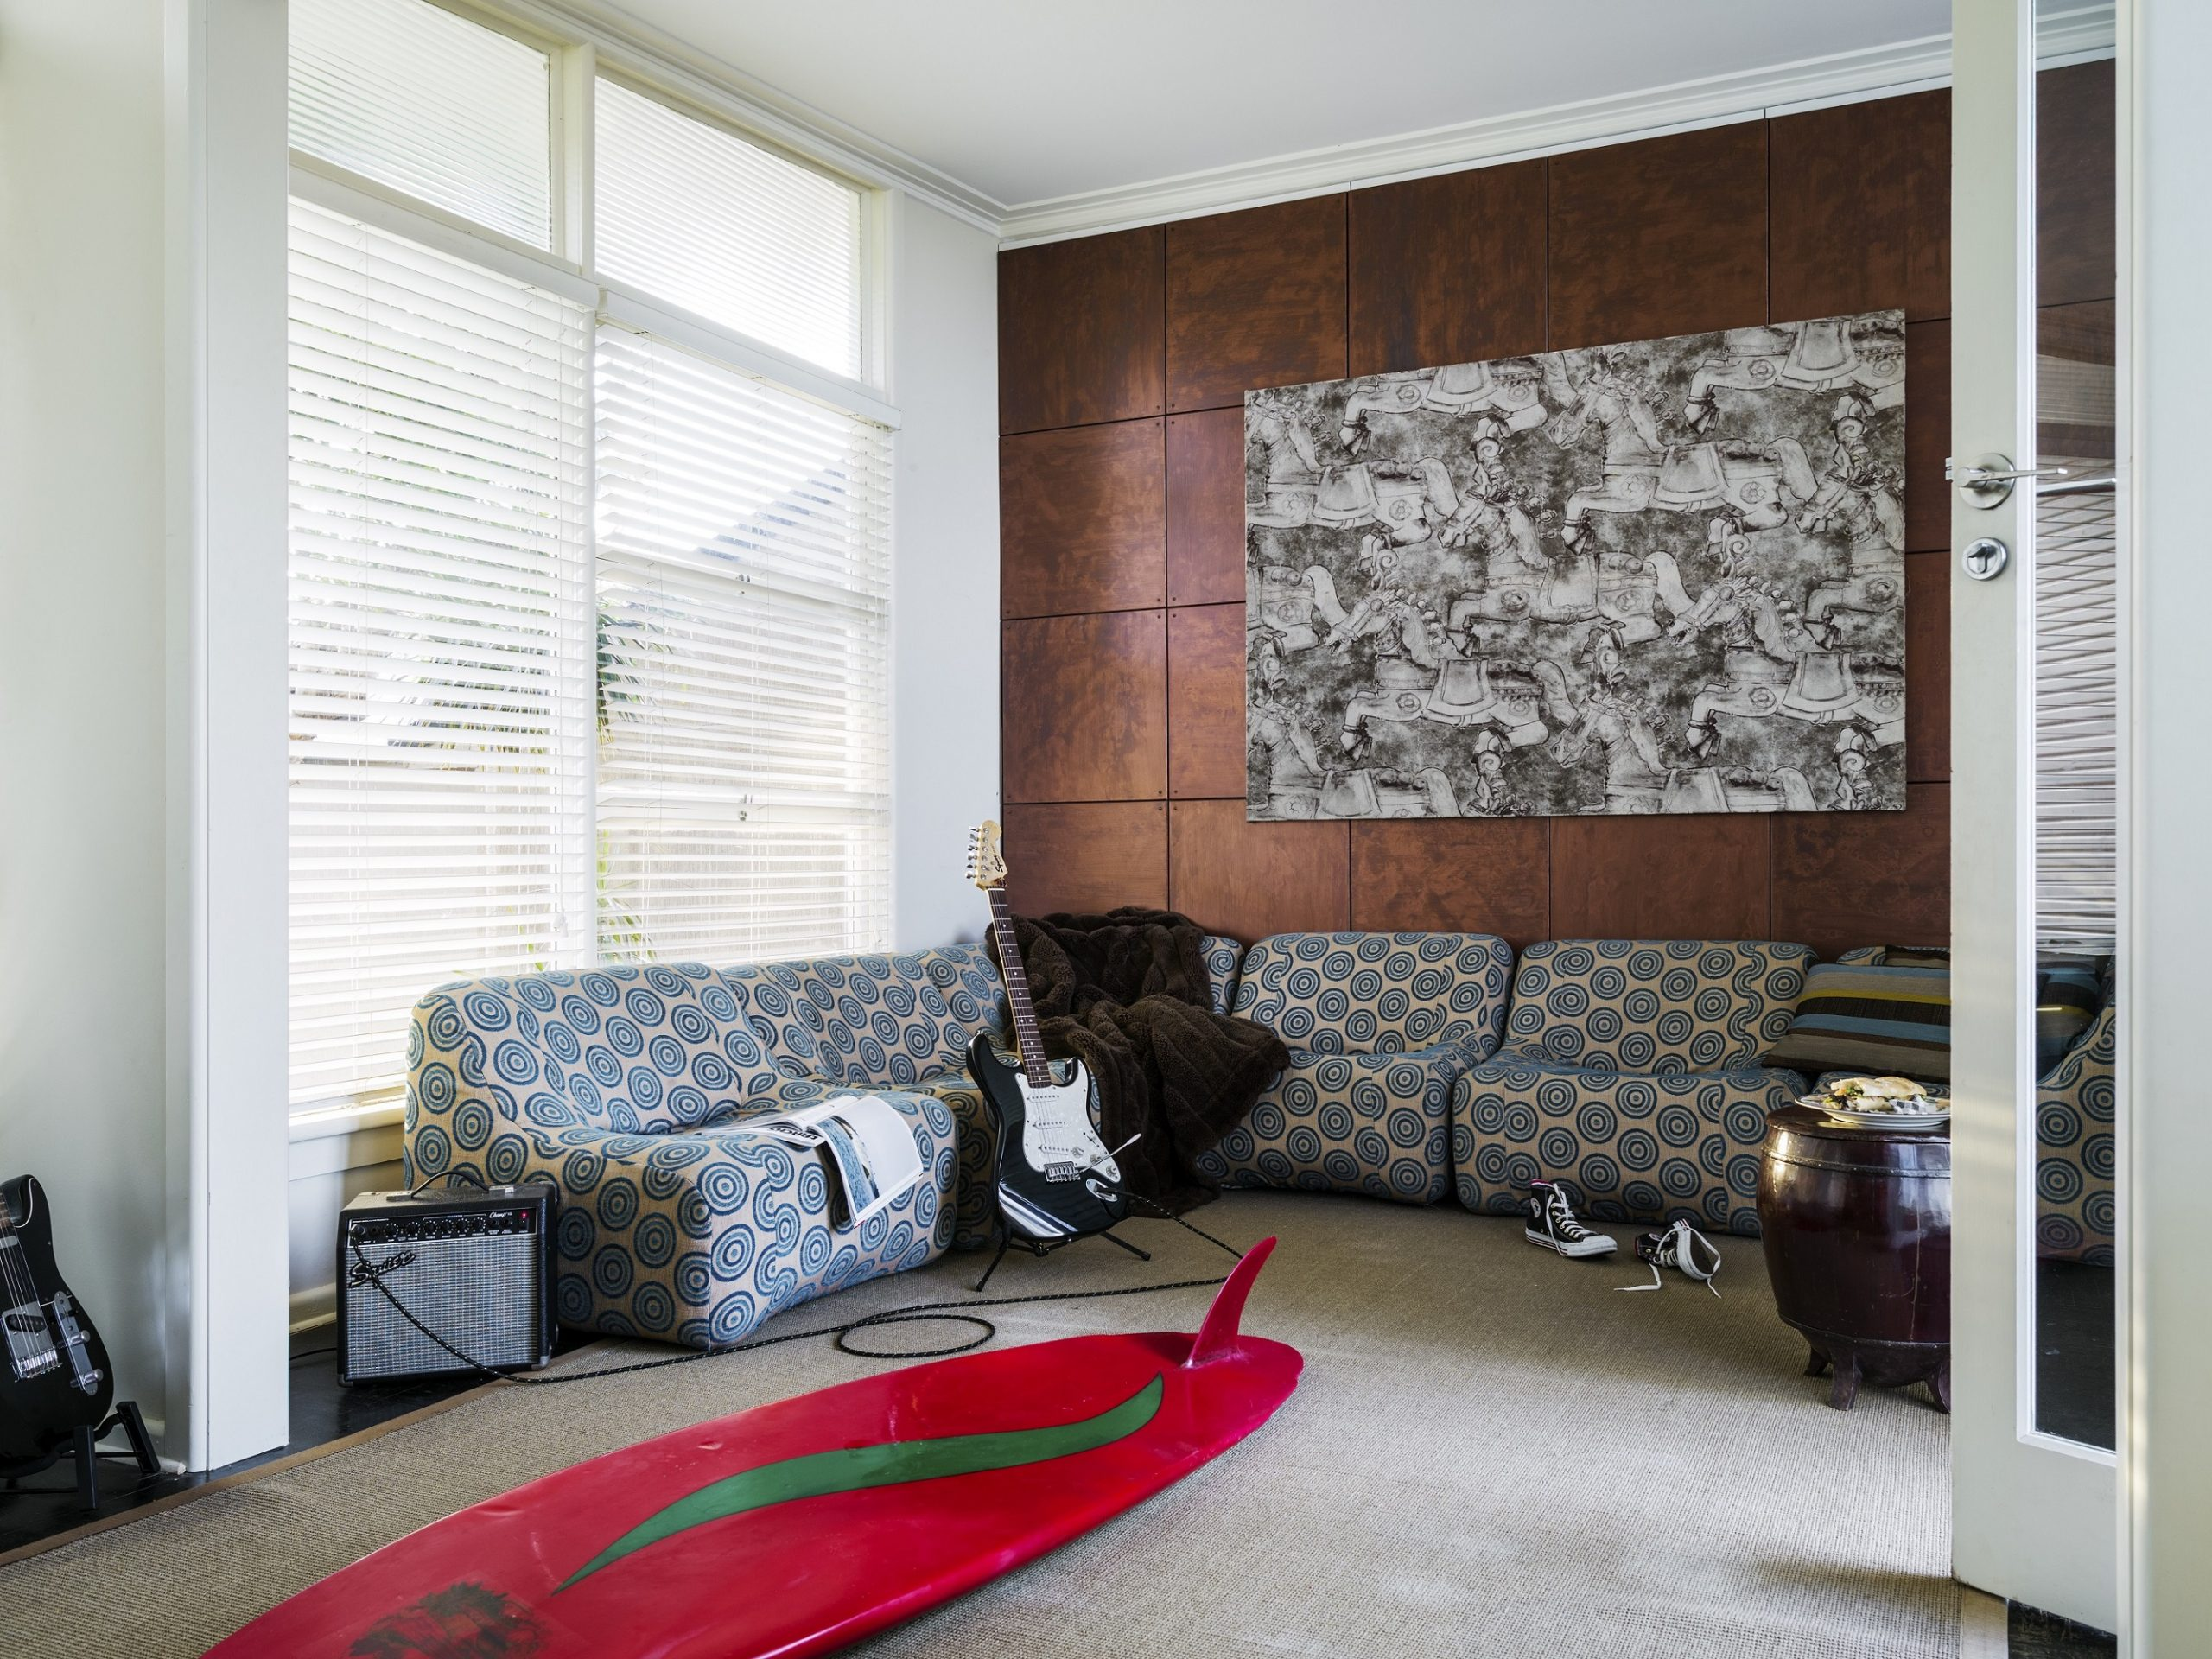 Retro-Interior-Design-1970s-Kiama-Michael-Bell-Architects-Sydney